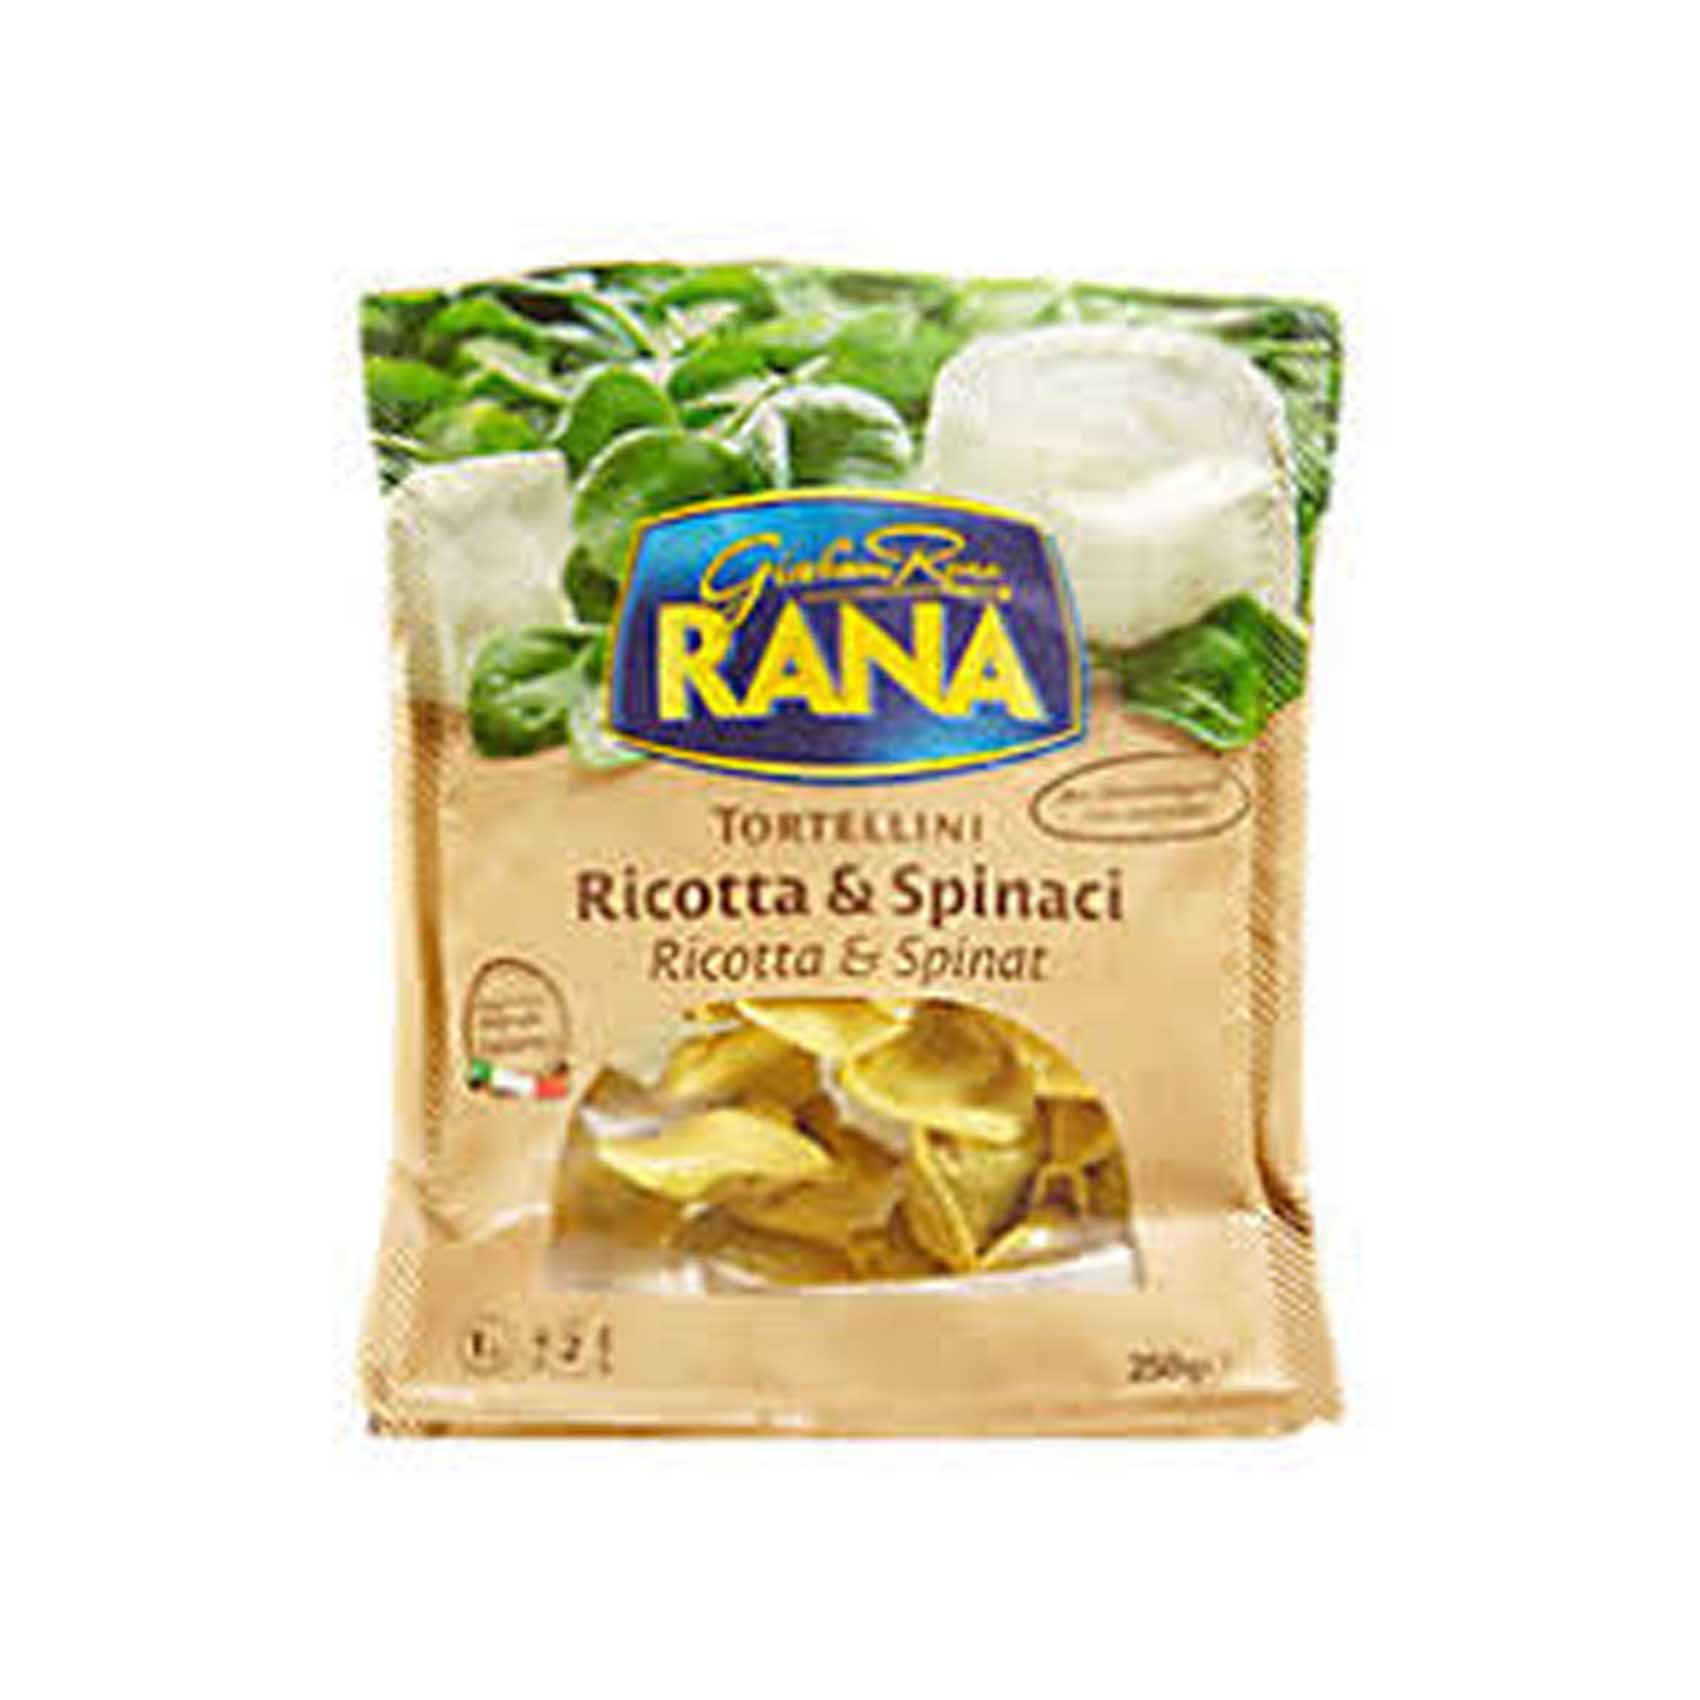 RANA TORT. & RICOTTA SPINACH 250G